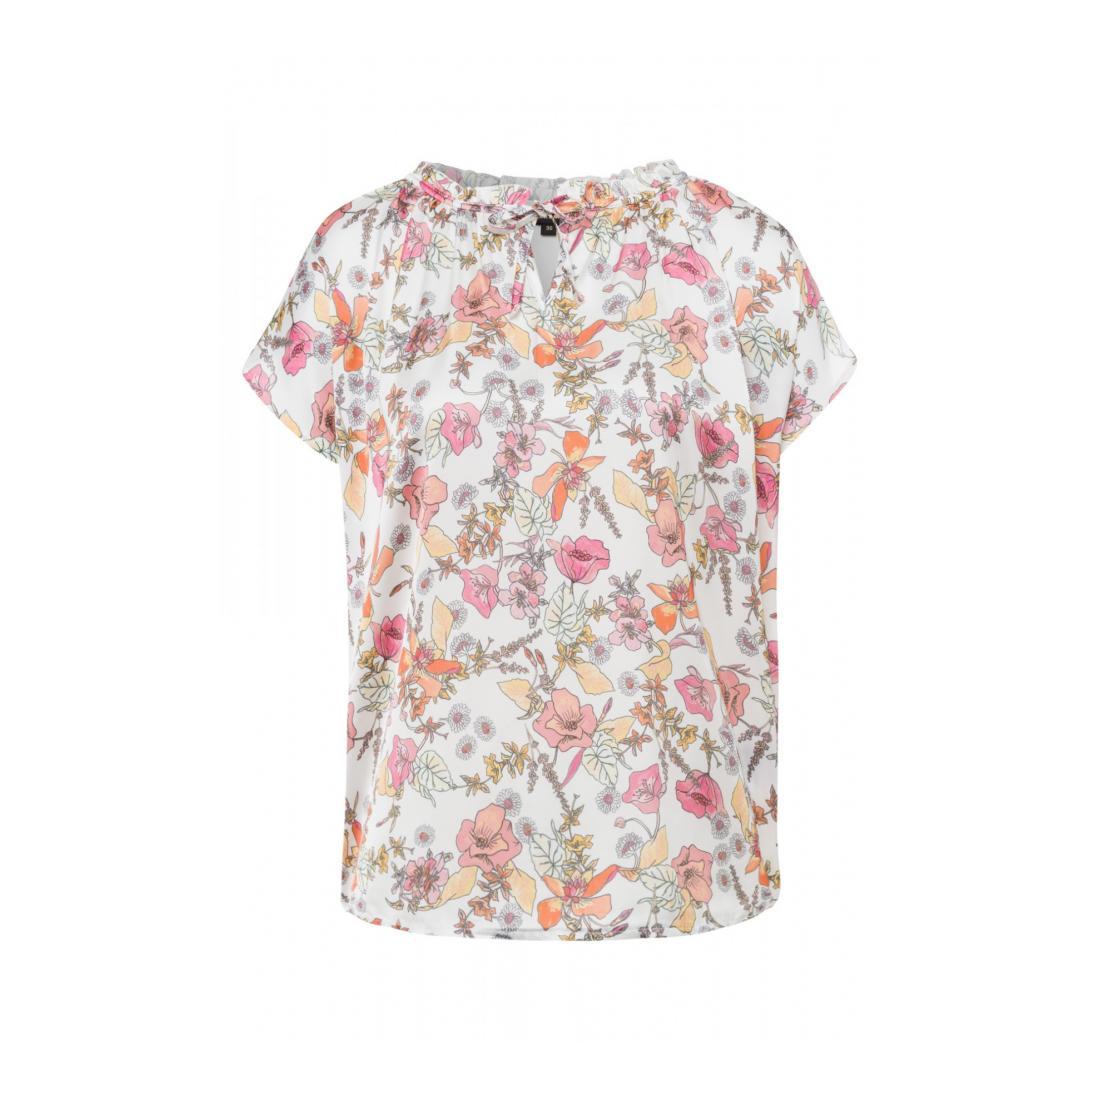 More & More T-Shirt Damen Shirt mit printed woven F